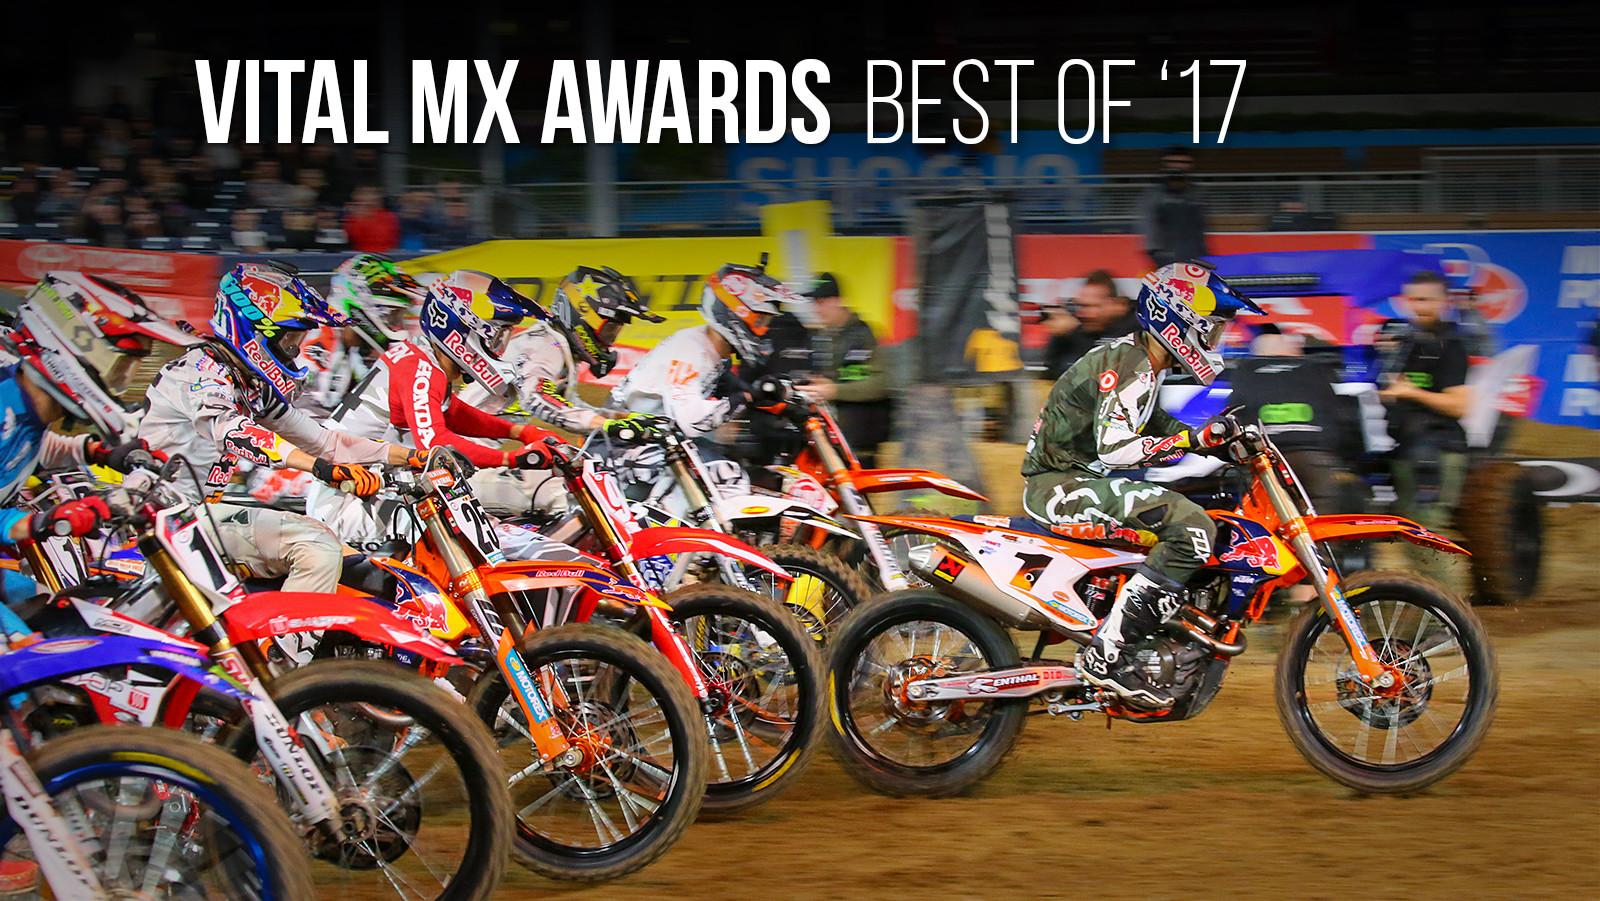 Vital MX Awards: The Best of '17